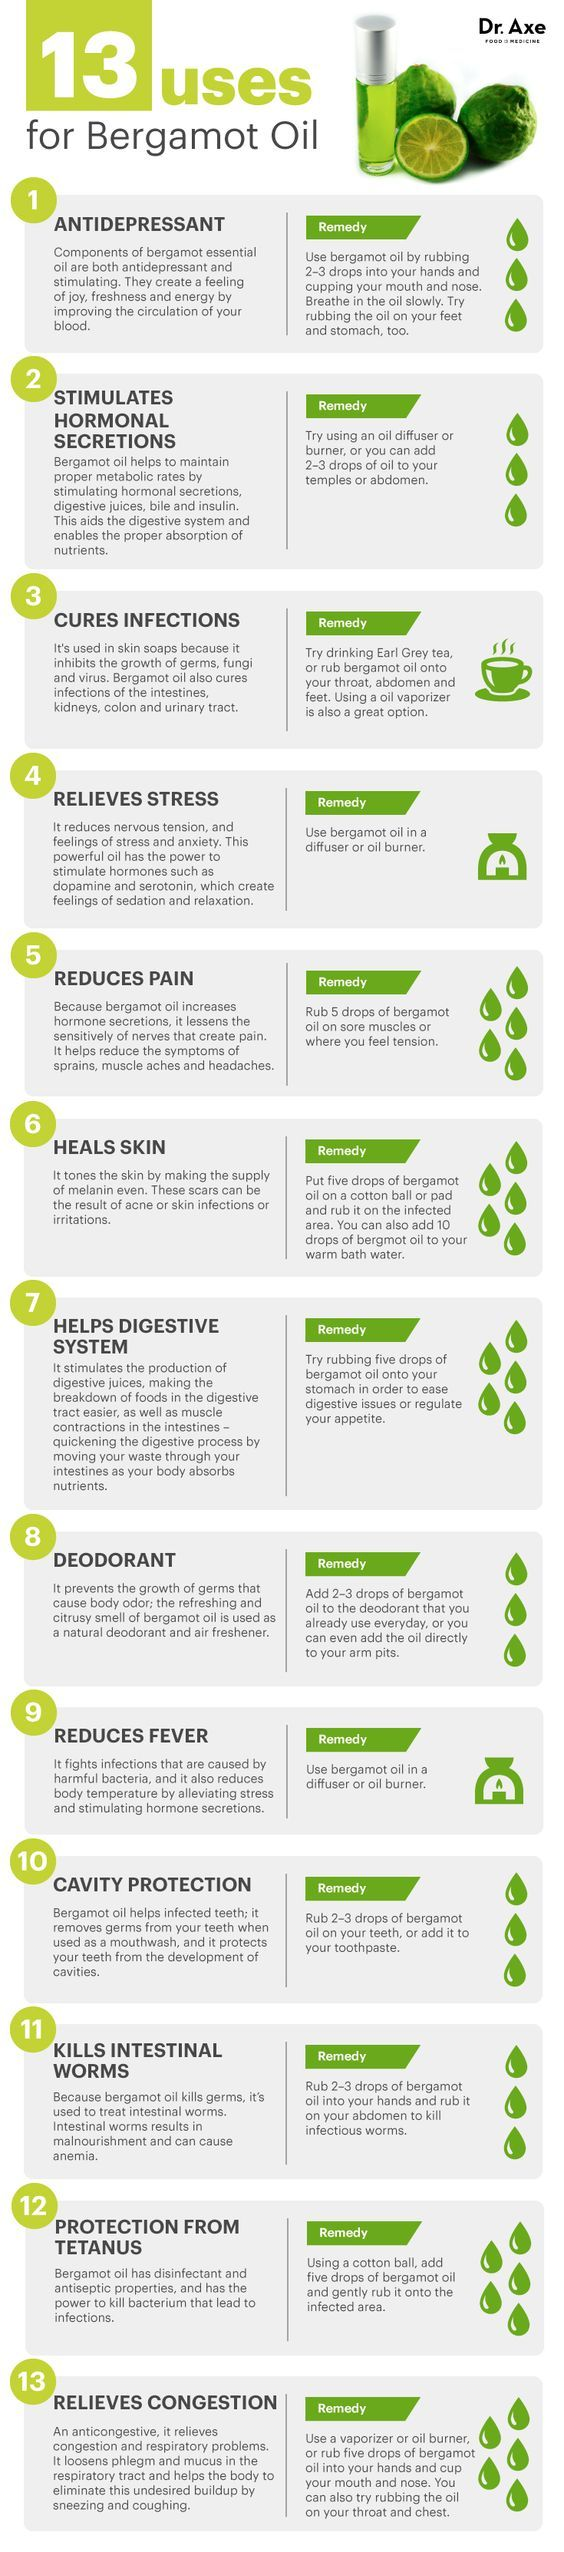 13 Bergamot Oil Uses  http://www.draxe.com #health #holistic #natural: